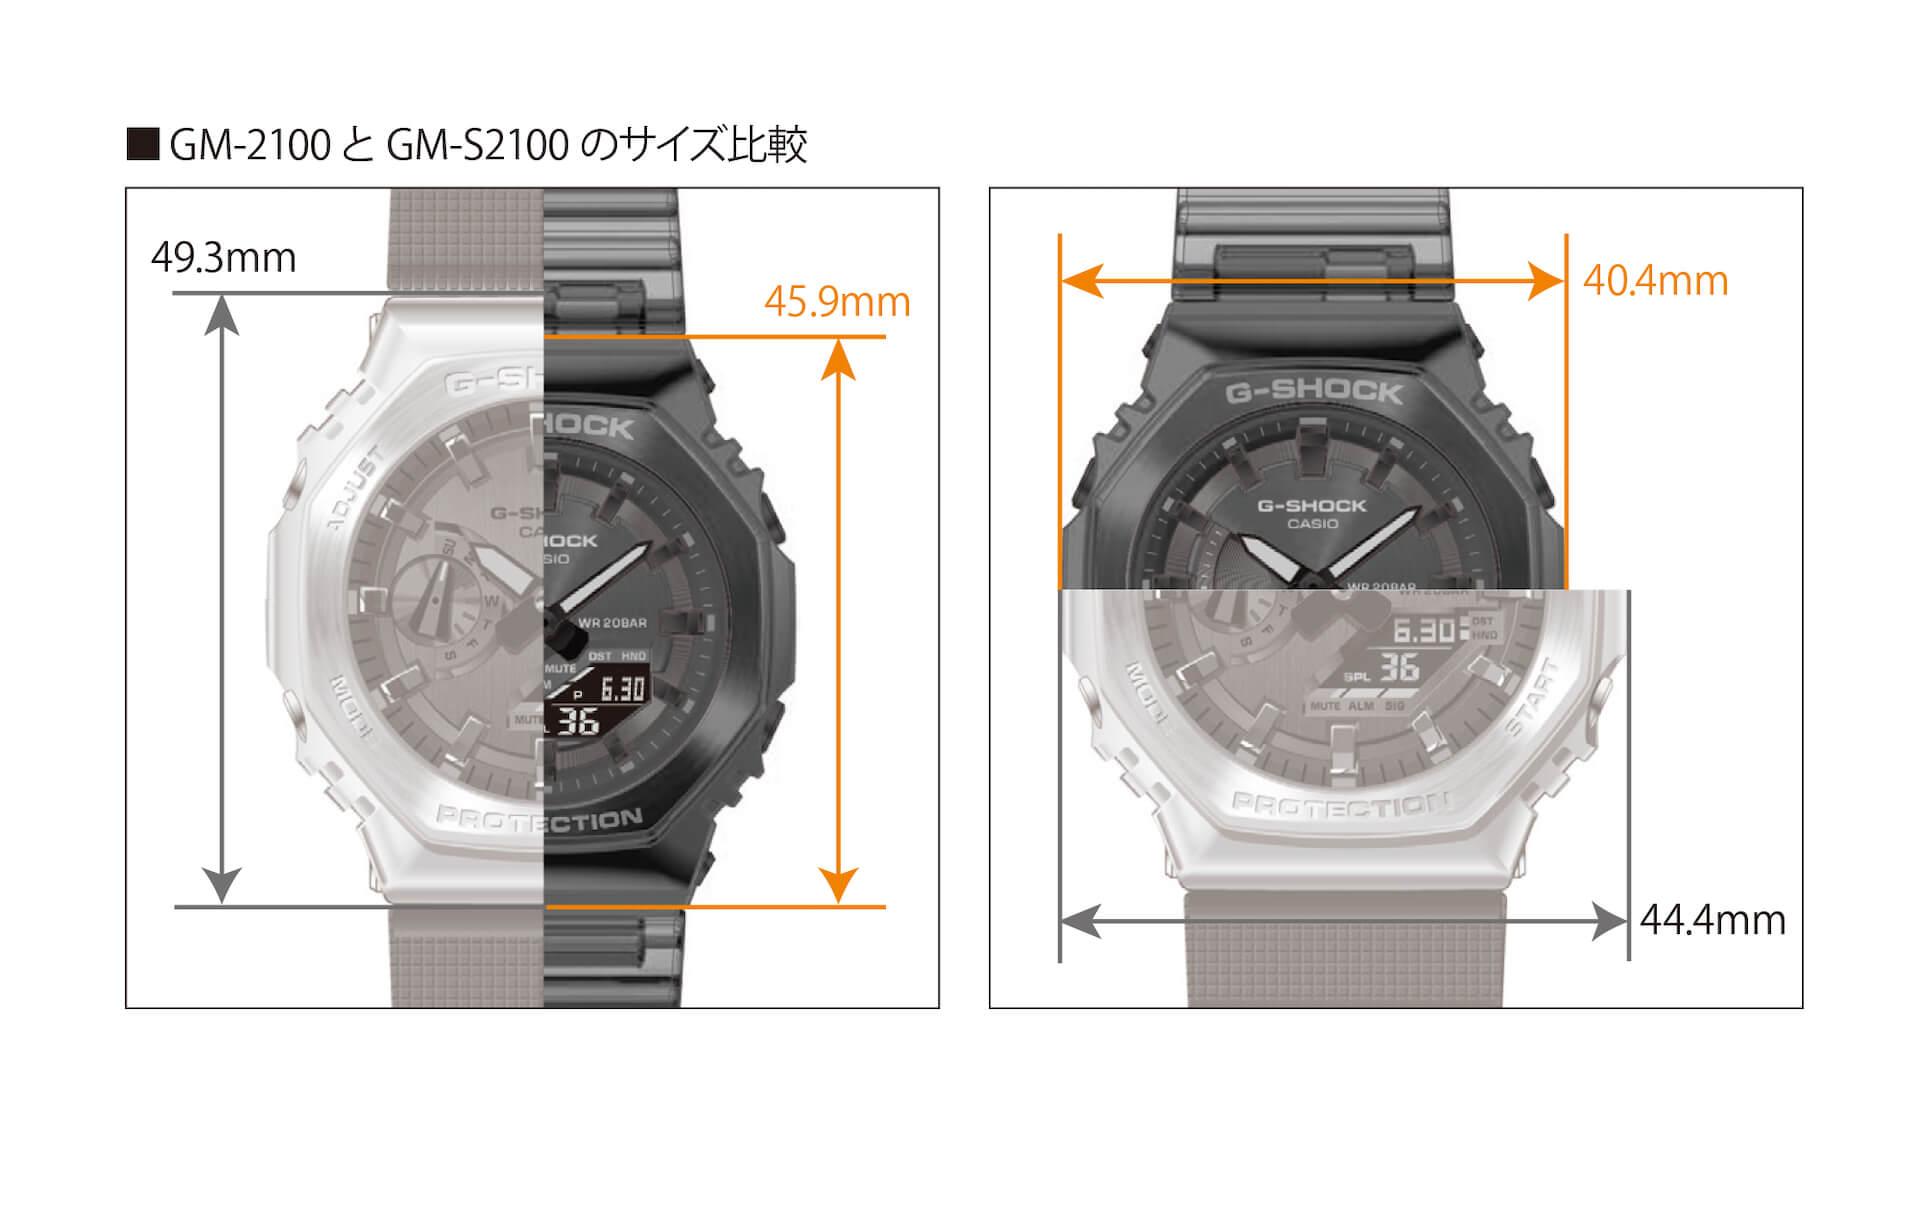 G-SHOCKにメタルベゼルを採用した新モデル2種が登場!『GM-2100』&『GM-S2100』が発売決定 tech210715_gshock_metal_8